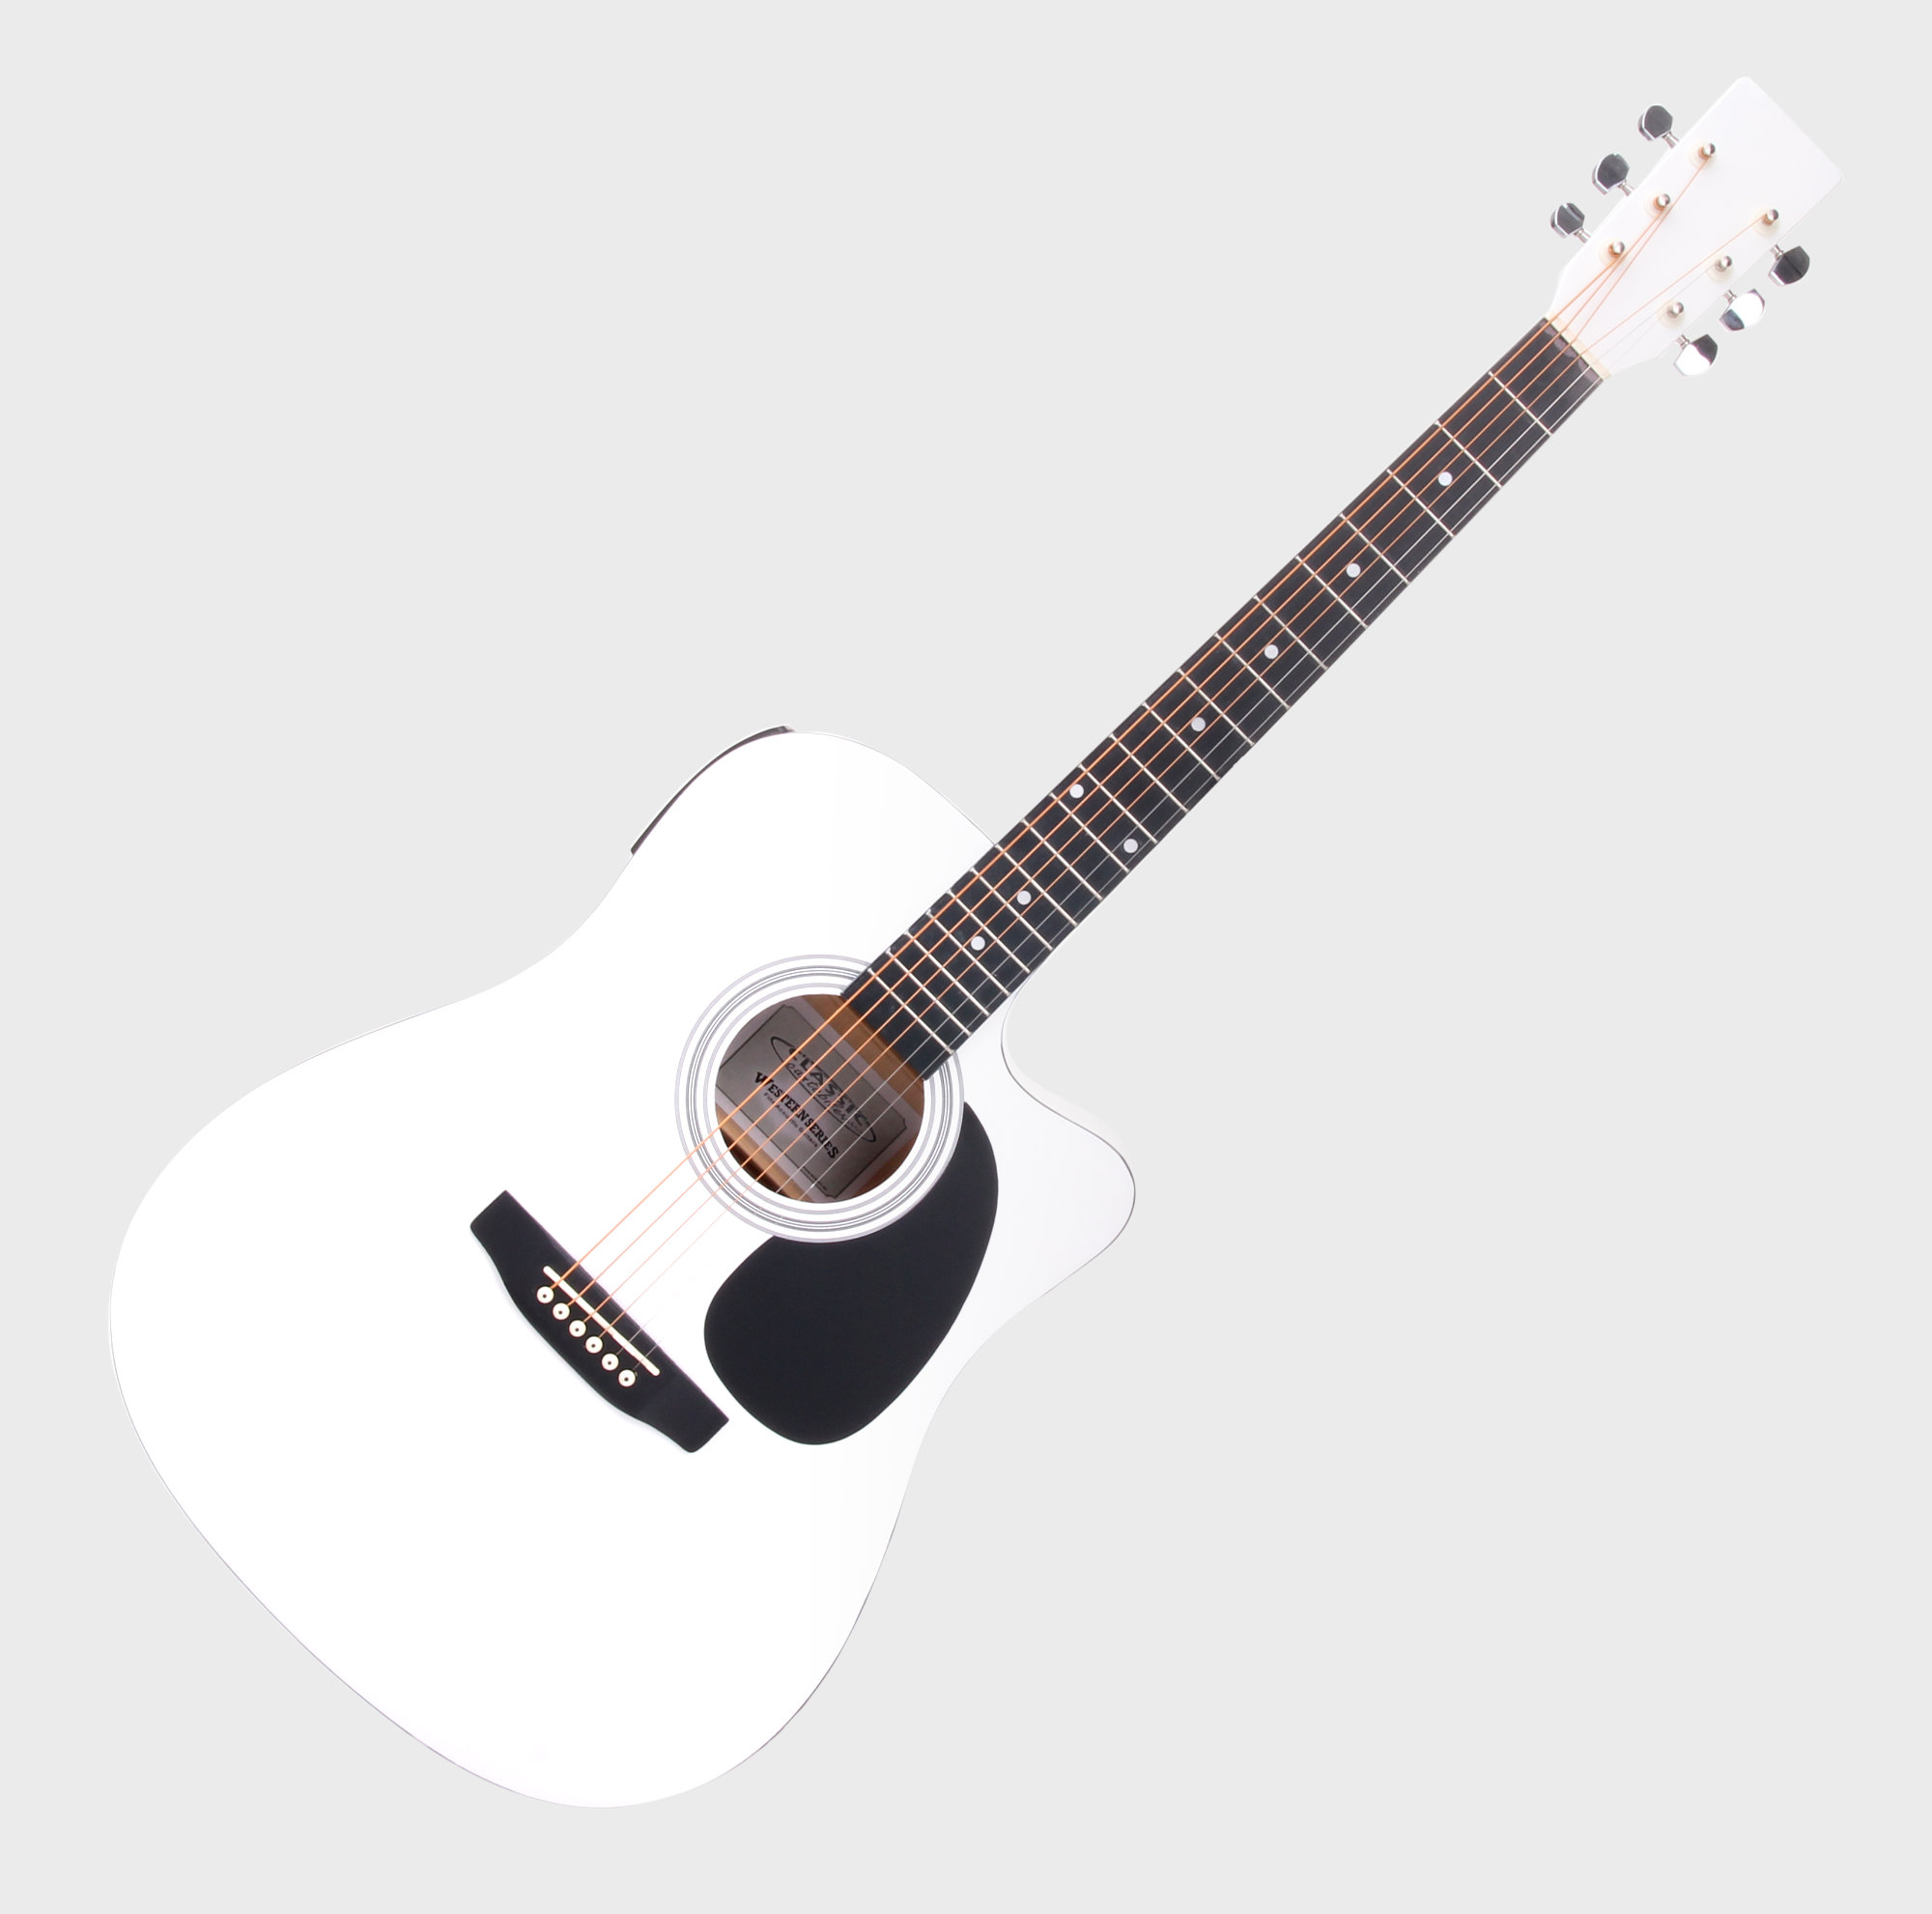 Classic Cantabile WS-10WH-CE Westerngitarre weiß mit Tonabnehmer